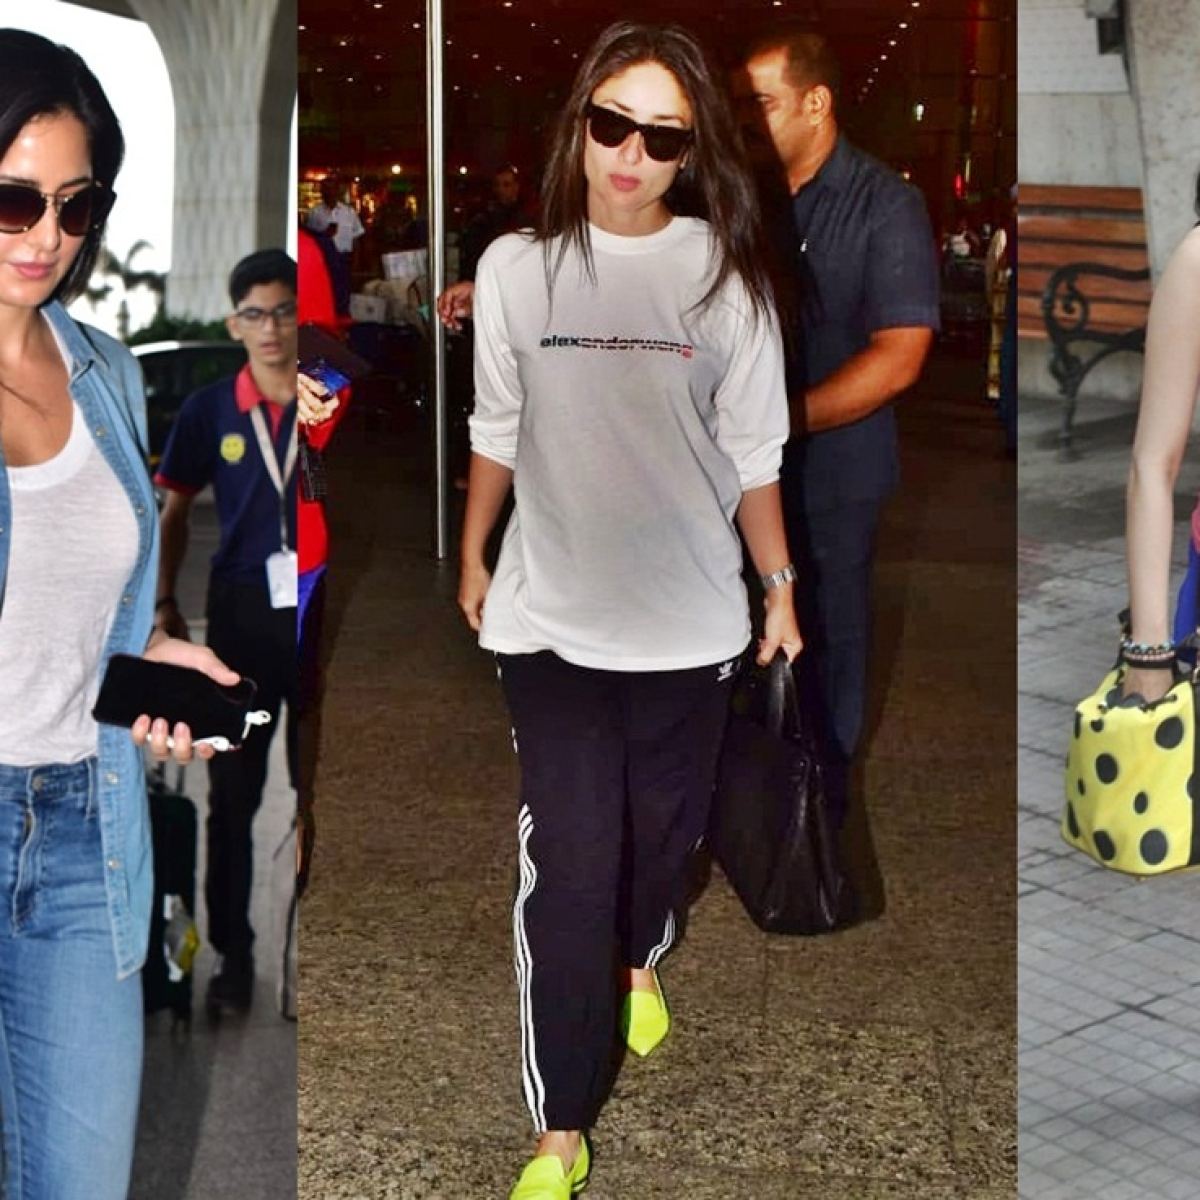 Celebrity Spotting: Katrina Kaif, Kareena Kapoor, Janhvi Kapoor and more